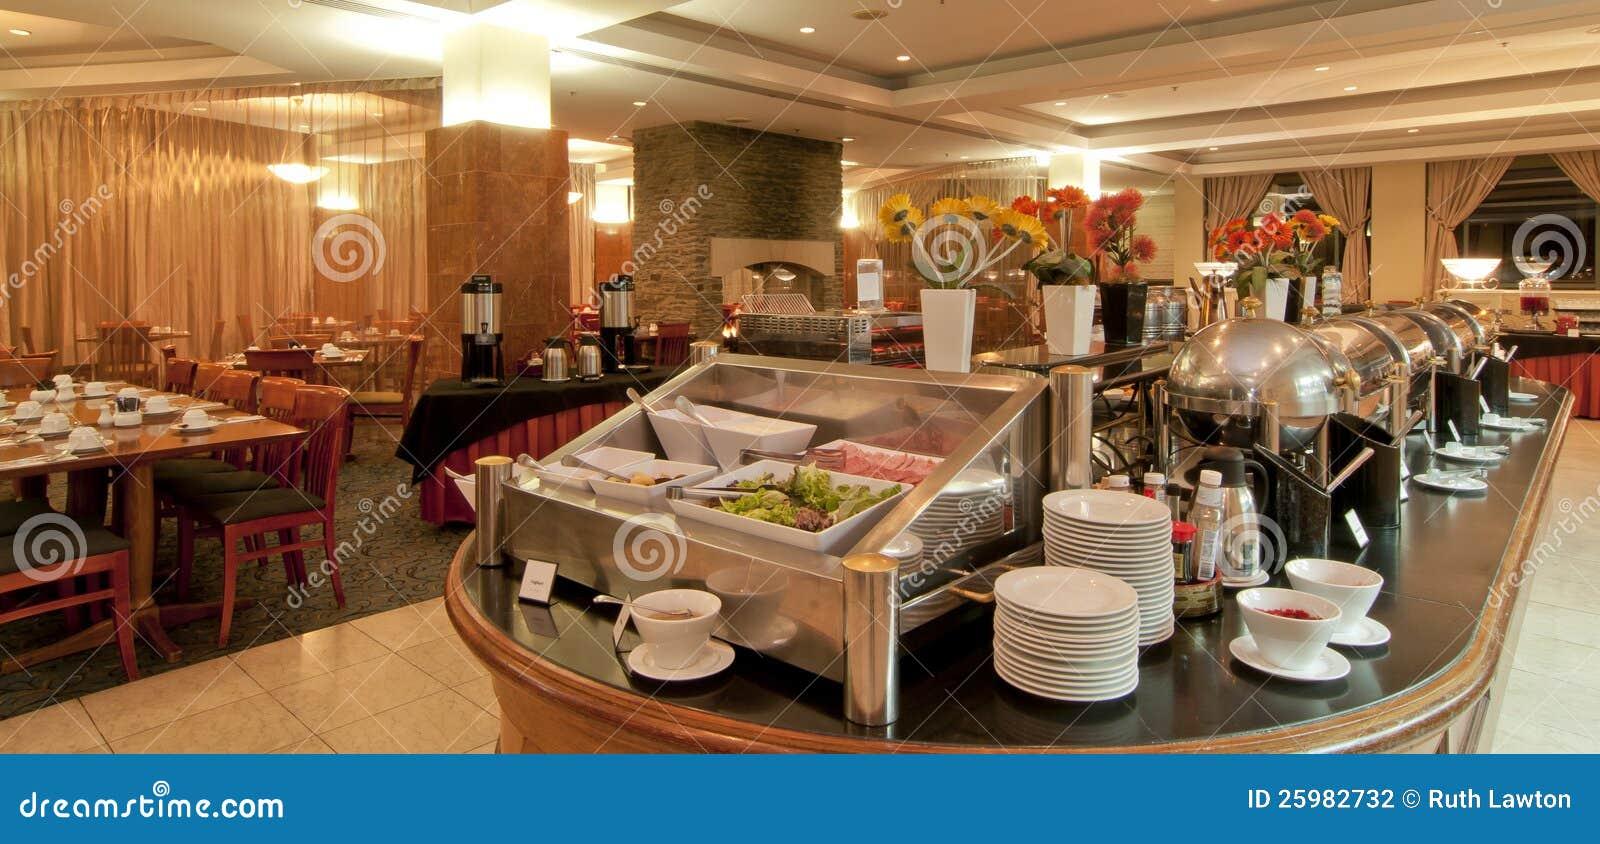 Mon Ami Gabi  Las Vegas  Main Dining Room Restaurant